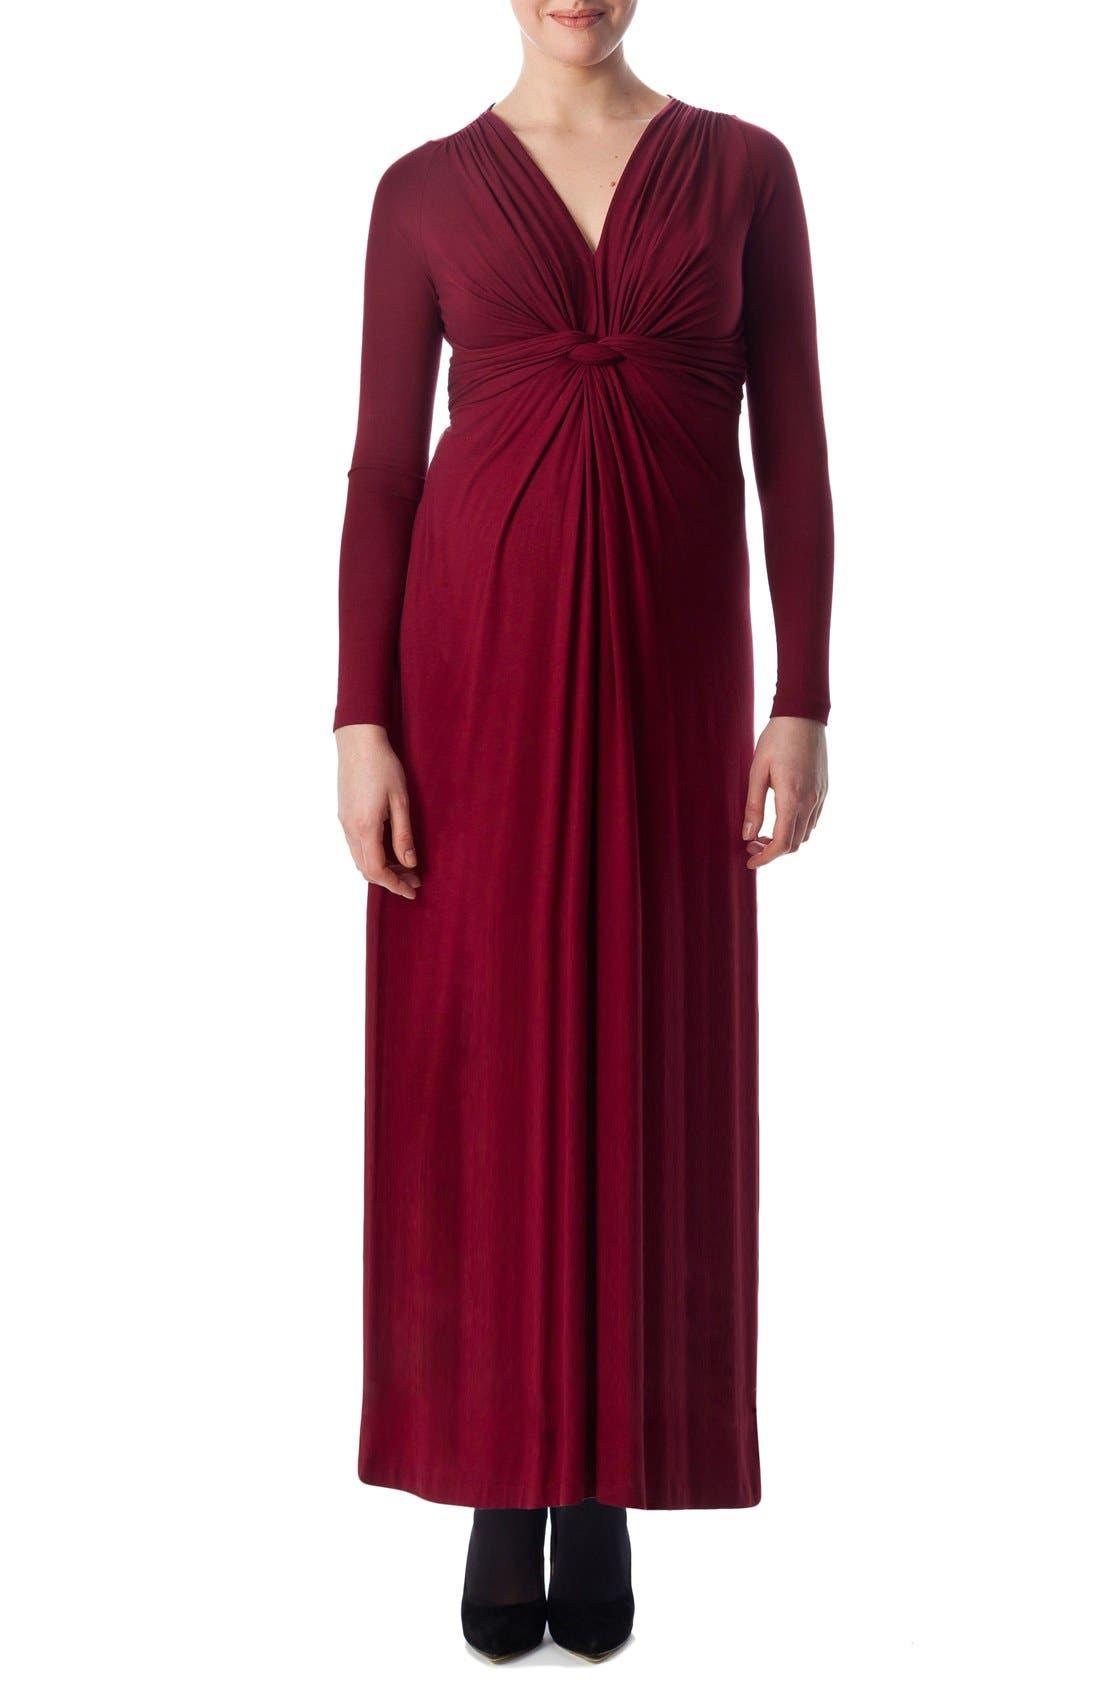 Madonna Maternity Maxi Dress,                         Main,                         color, 600